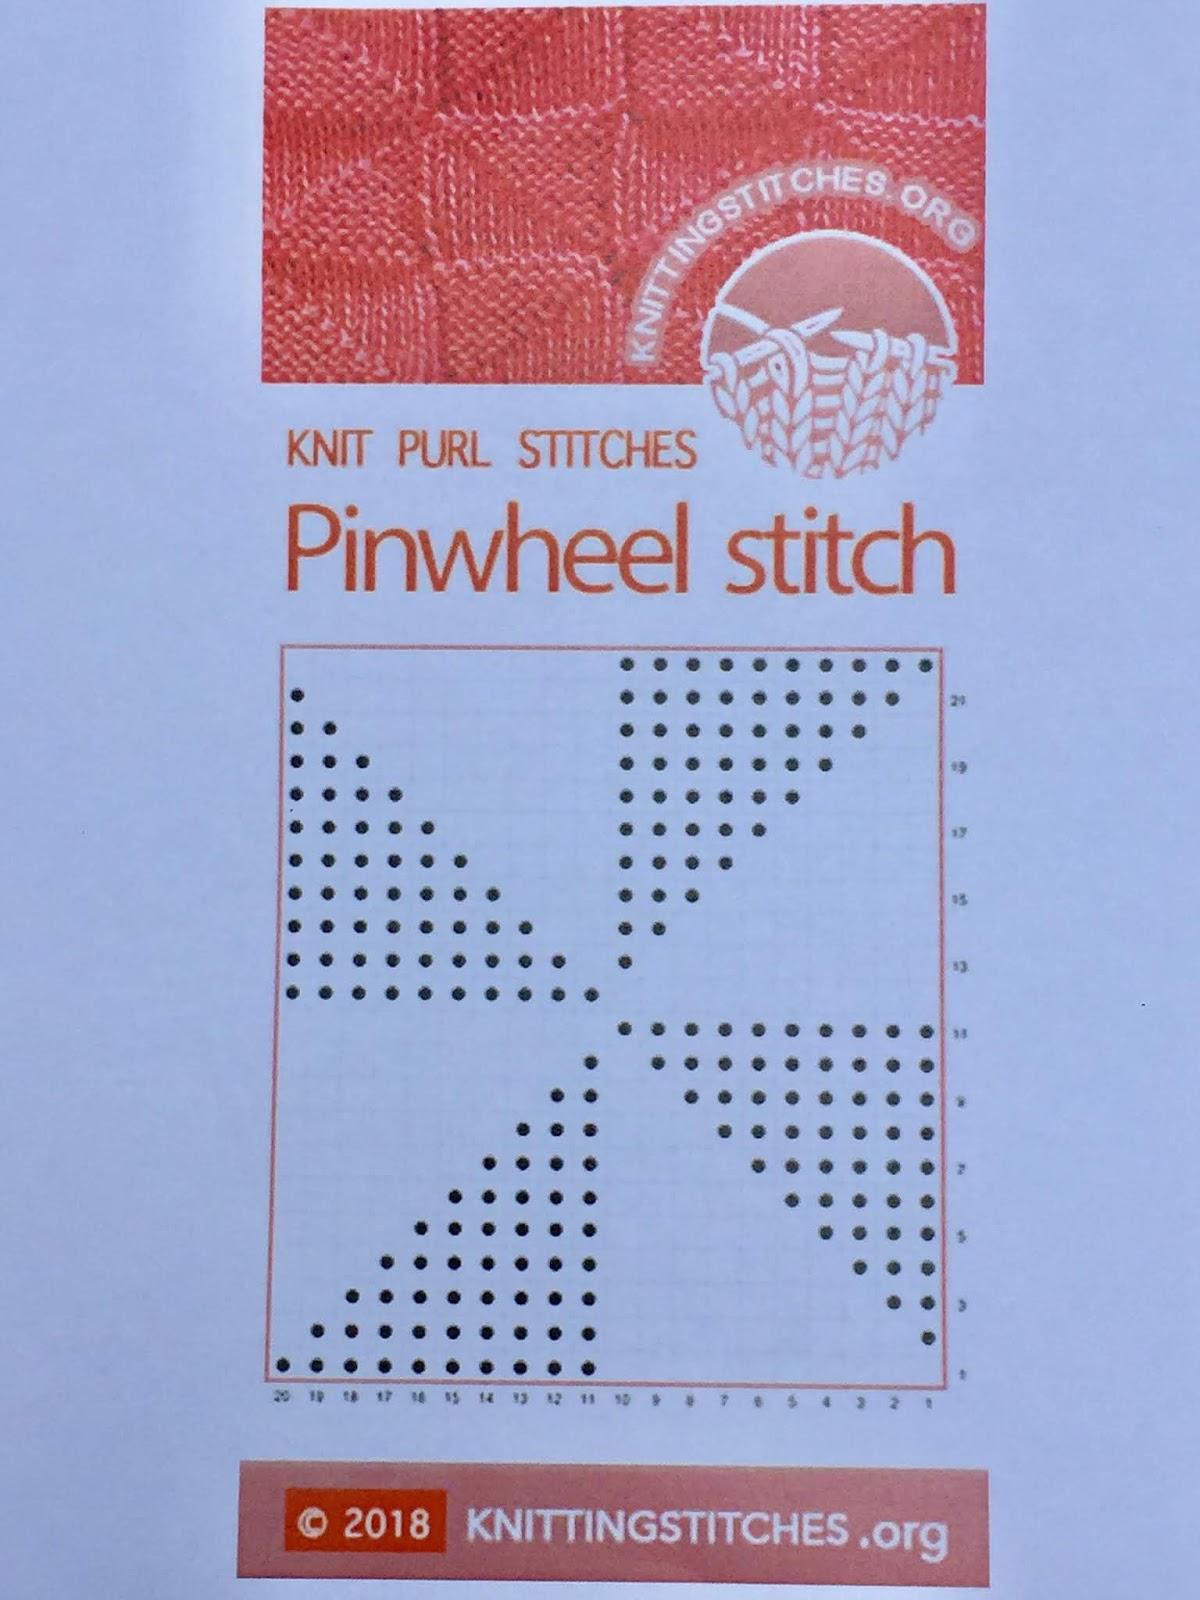 Knitting Stitch 2018 - Pinwheel Knit Purl Reversible